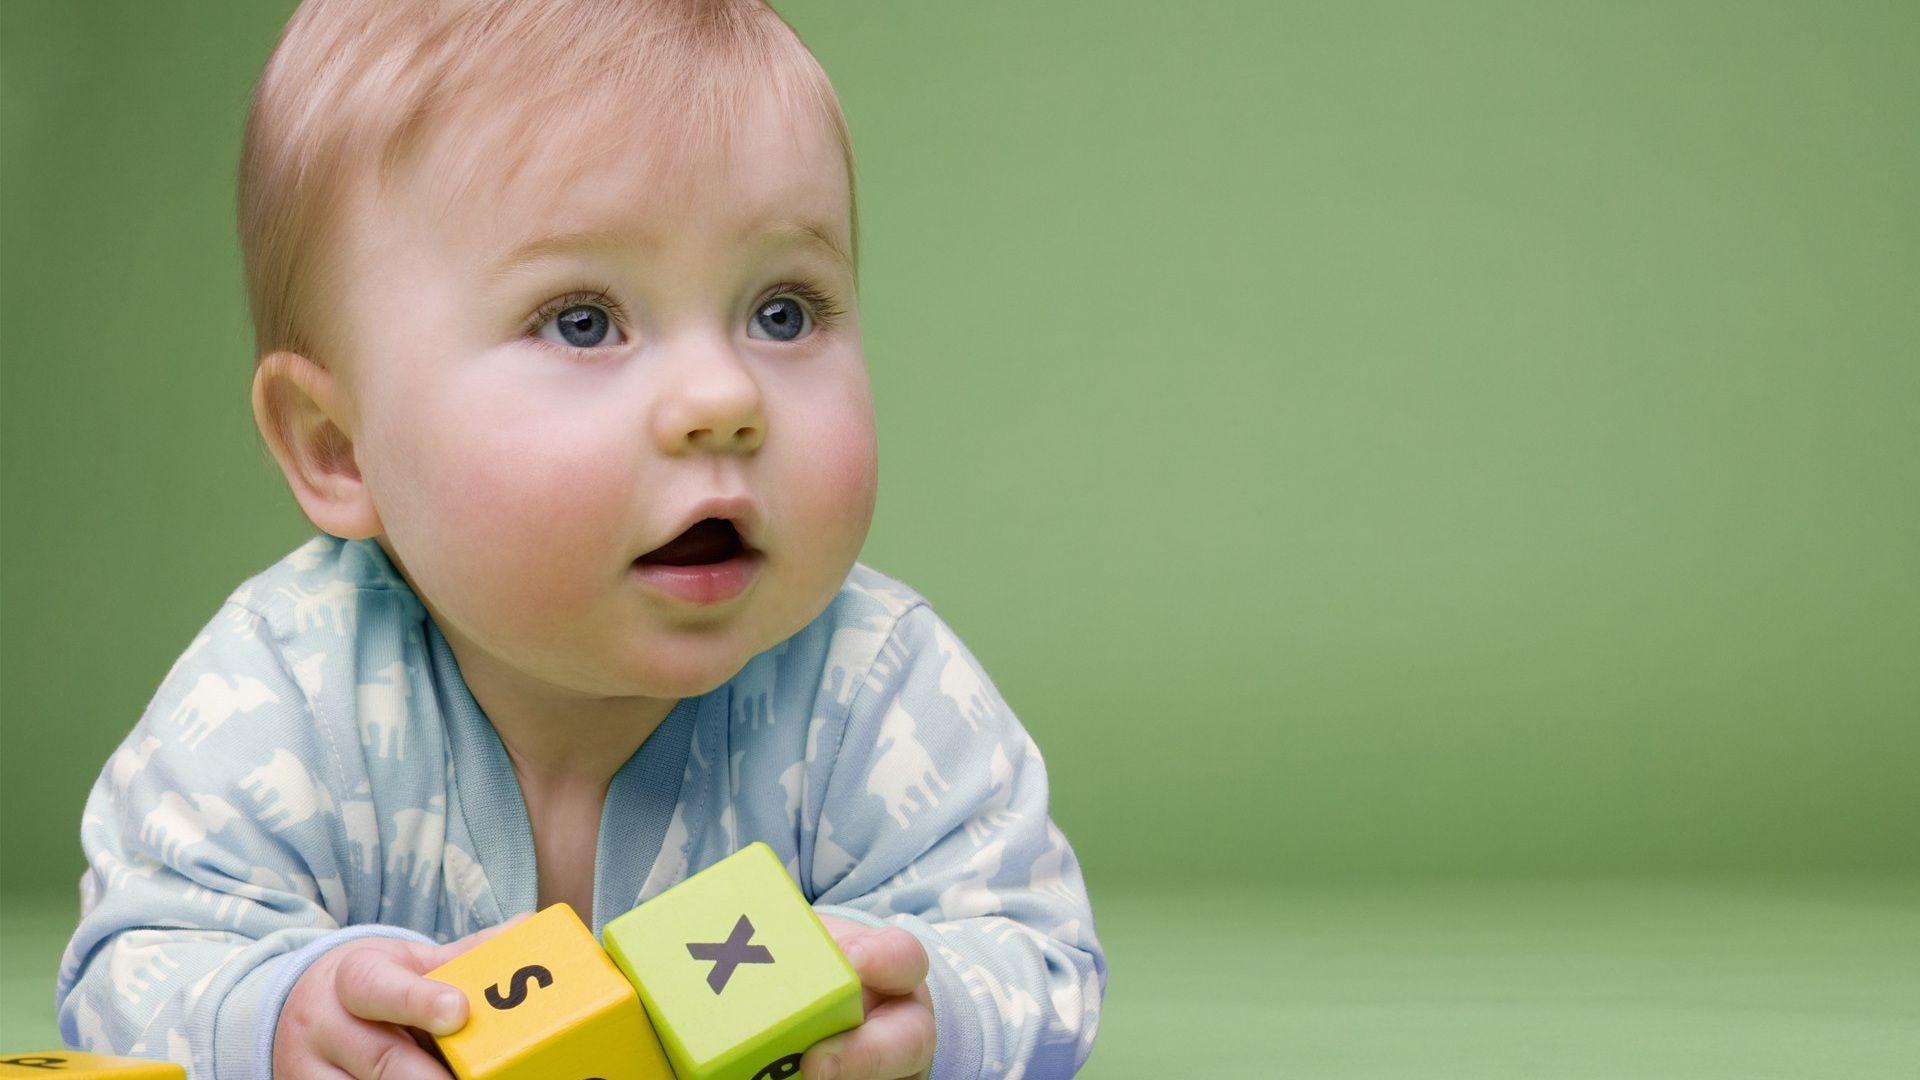 Baby Boy Cute wnload best Baby Boy Cute Wallpaper for